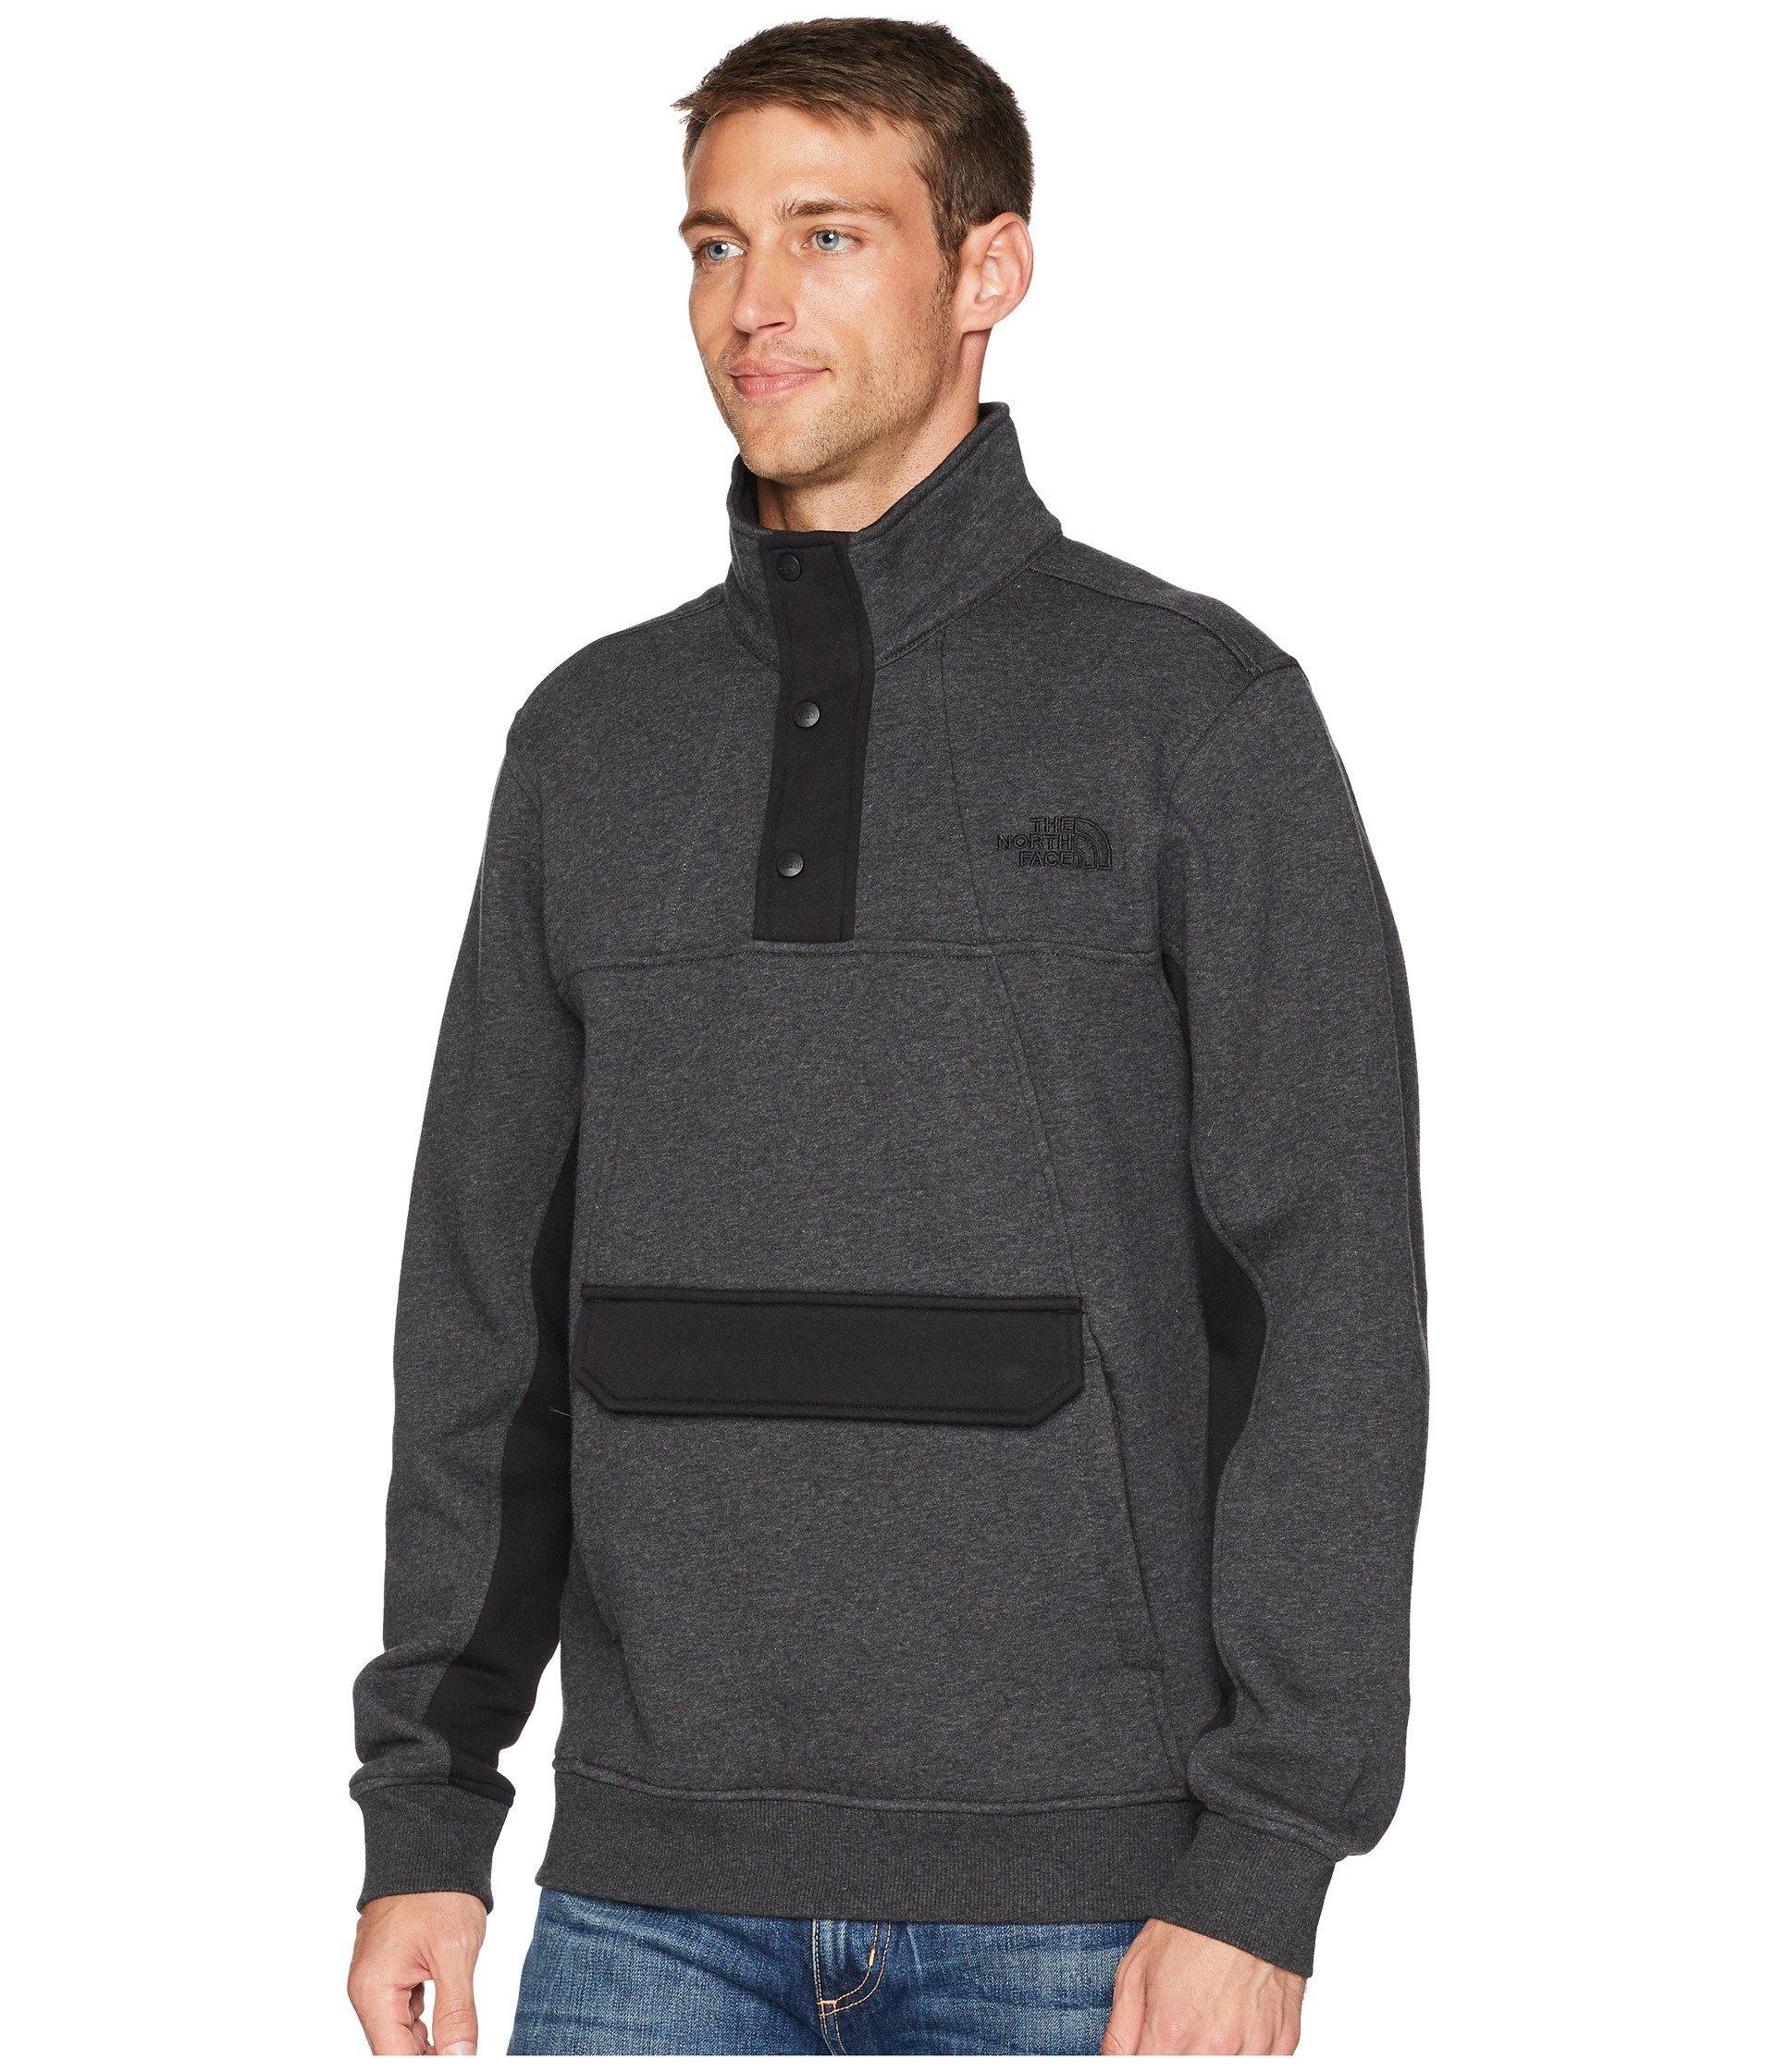 5e9dde47a9a3 Lyst - The North Face Alphabet City Fleece Pullover in Gray for Men - Save  50%